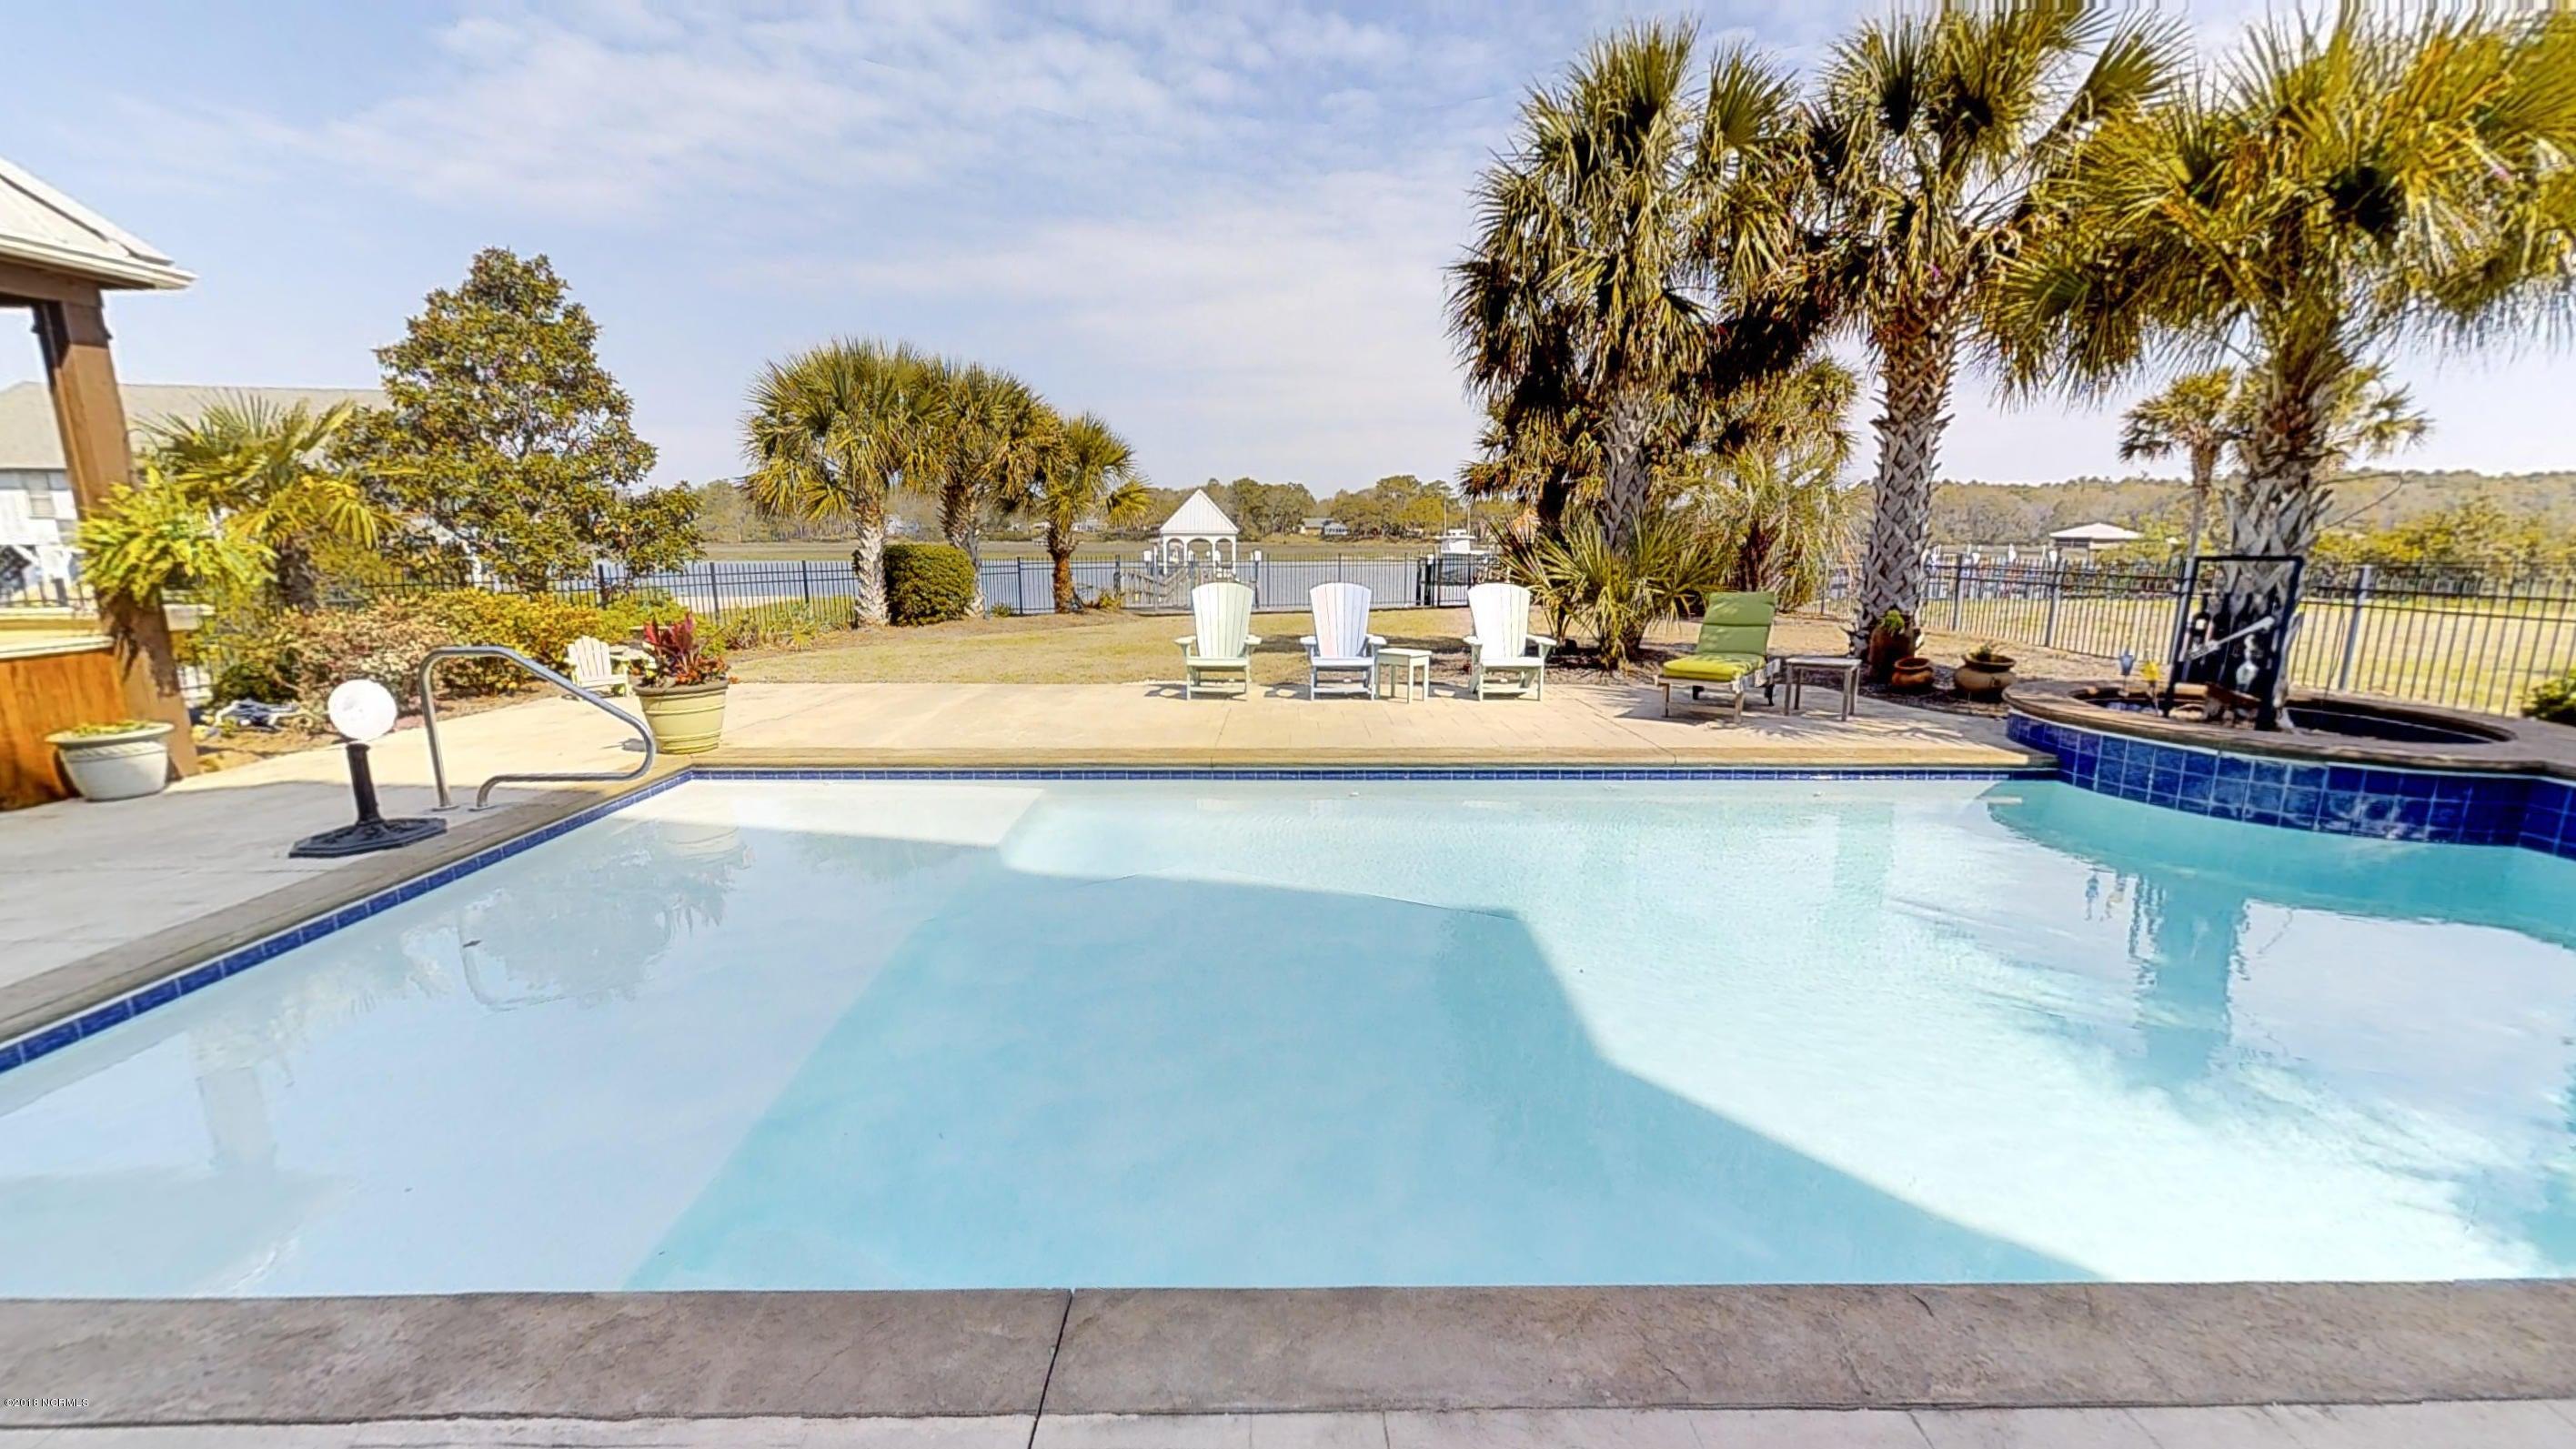 Ocean Isle Beach Real Estate - http://cdn.resize.sparkplatform.com/ncr/1024x768/true/20180414120438810643000000-o.jpg